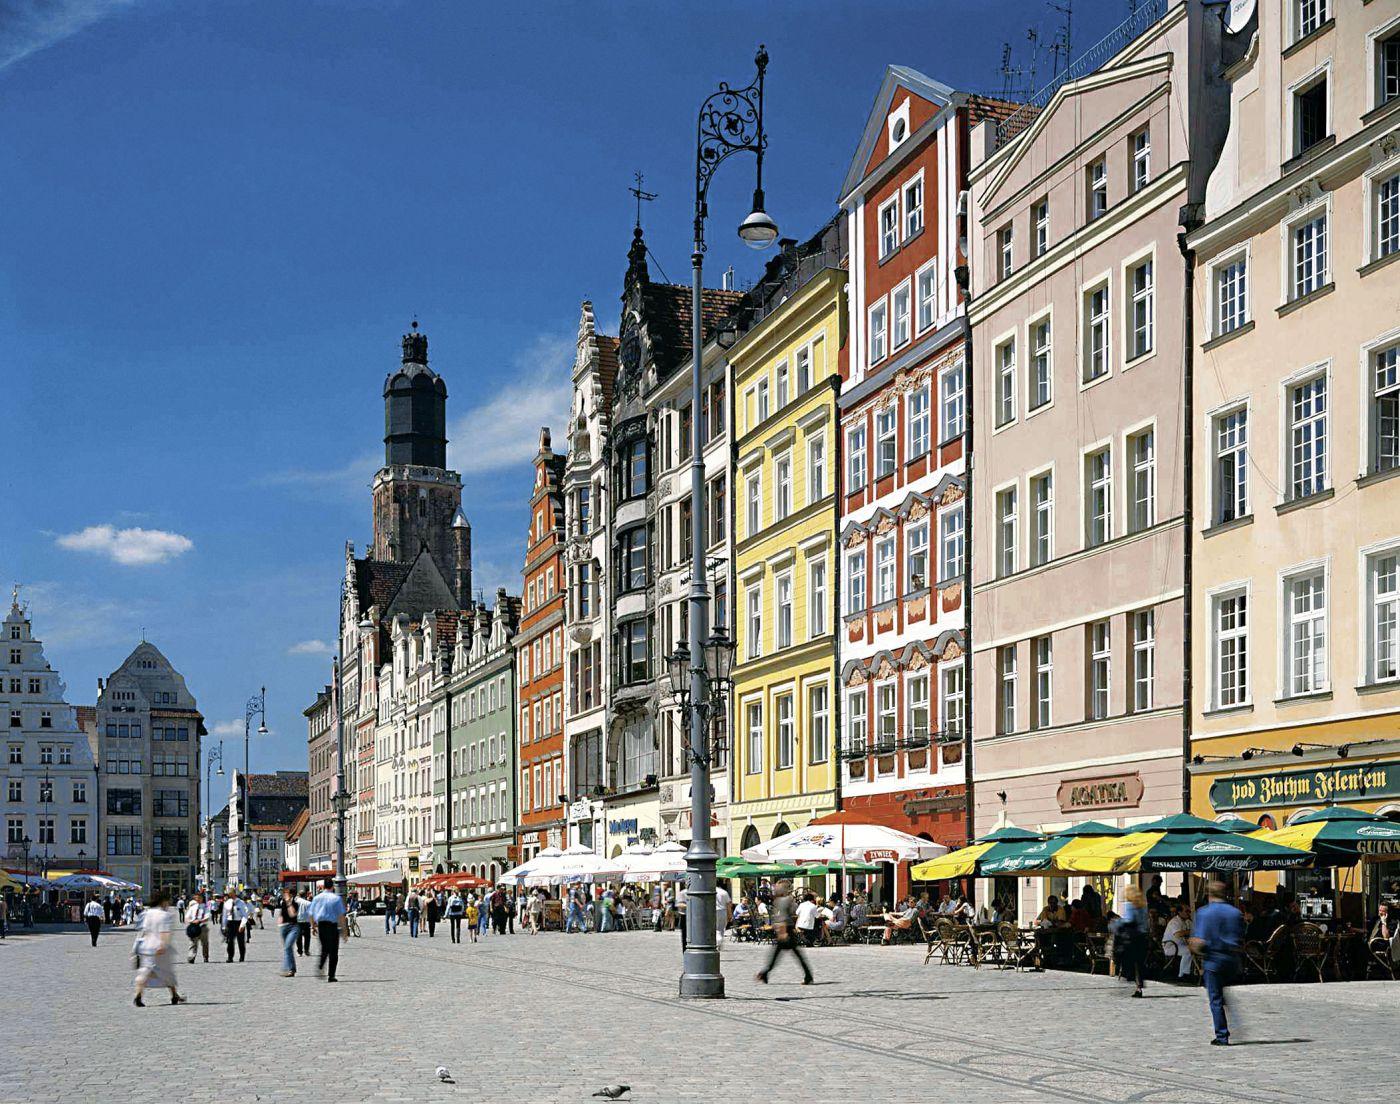 Polen Breslau Altstadt (c) Polnisches Fremdenverkehrsamt